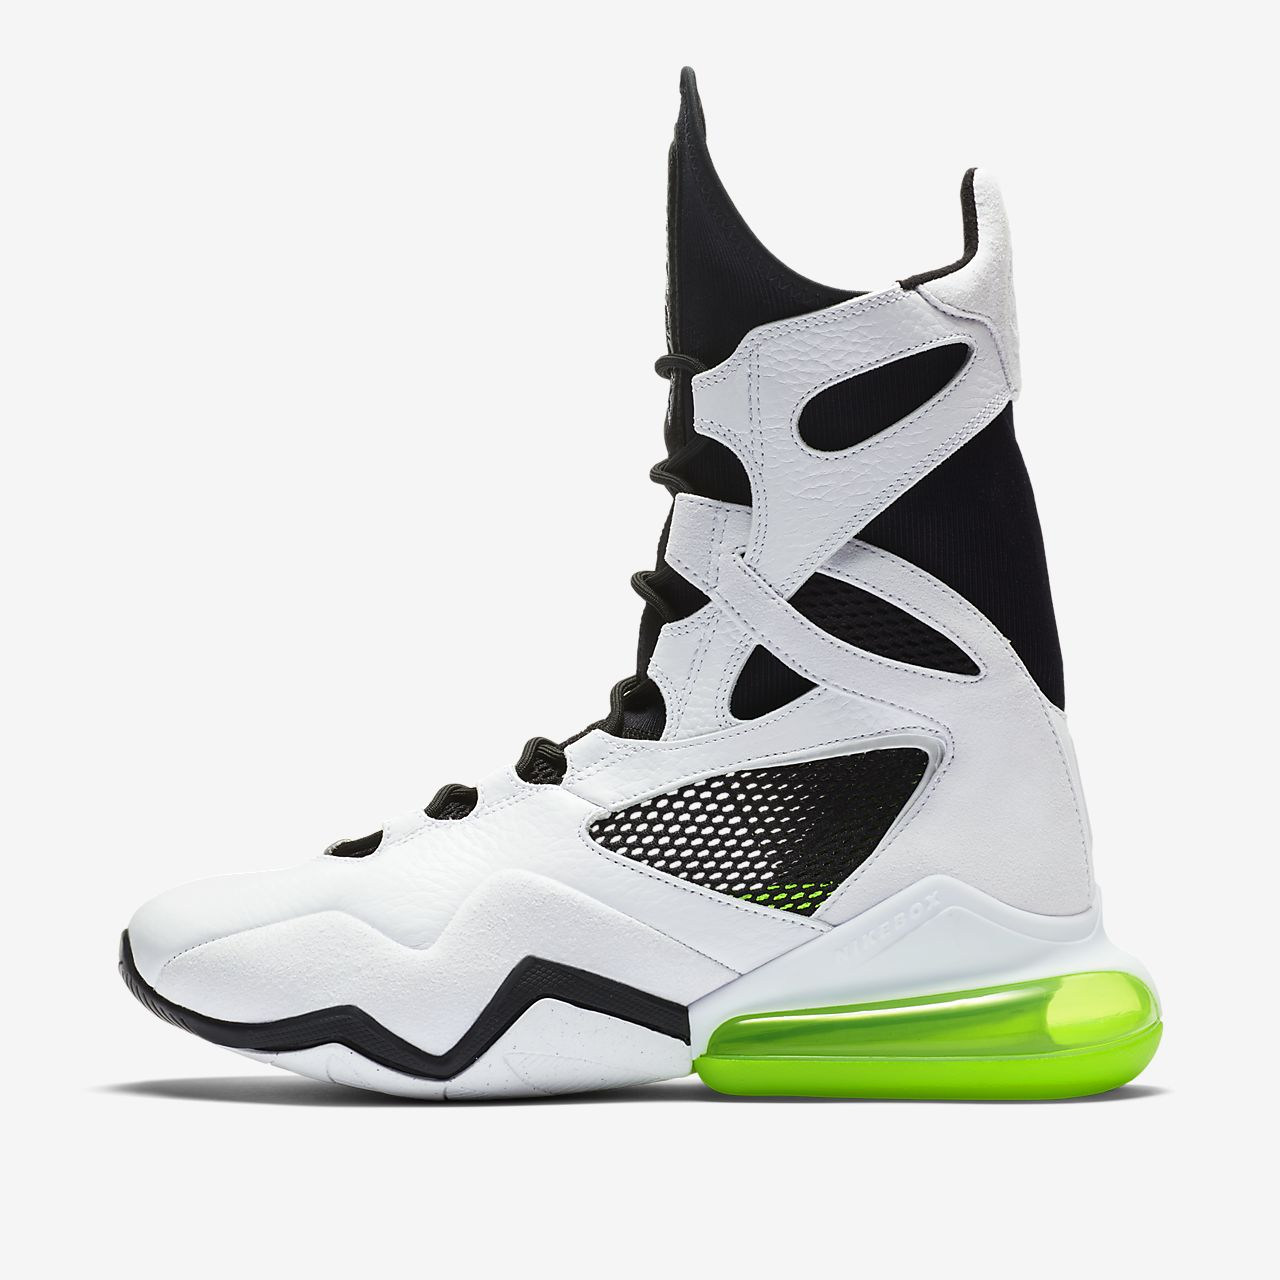 De Max Box Nike FemmeBe Training Air Pour Chaussure 7Ygbyvf6